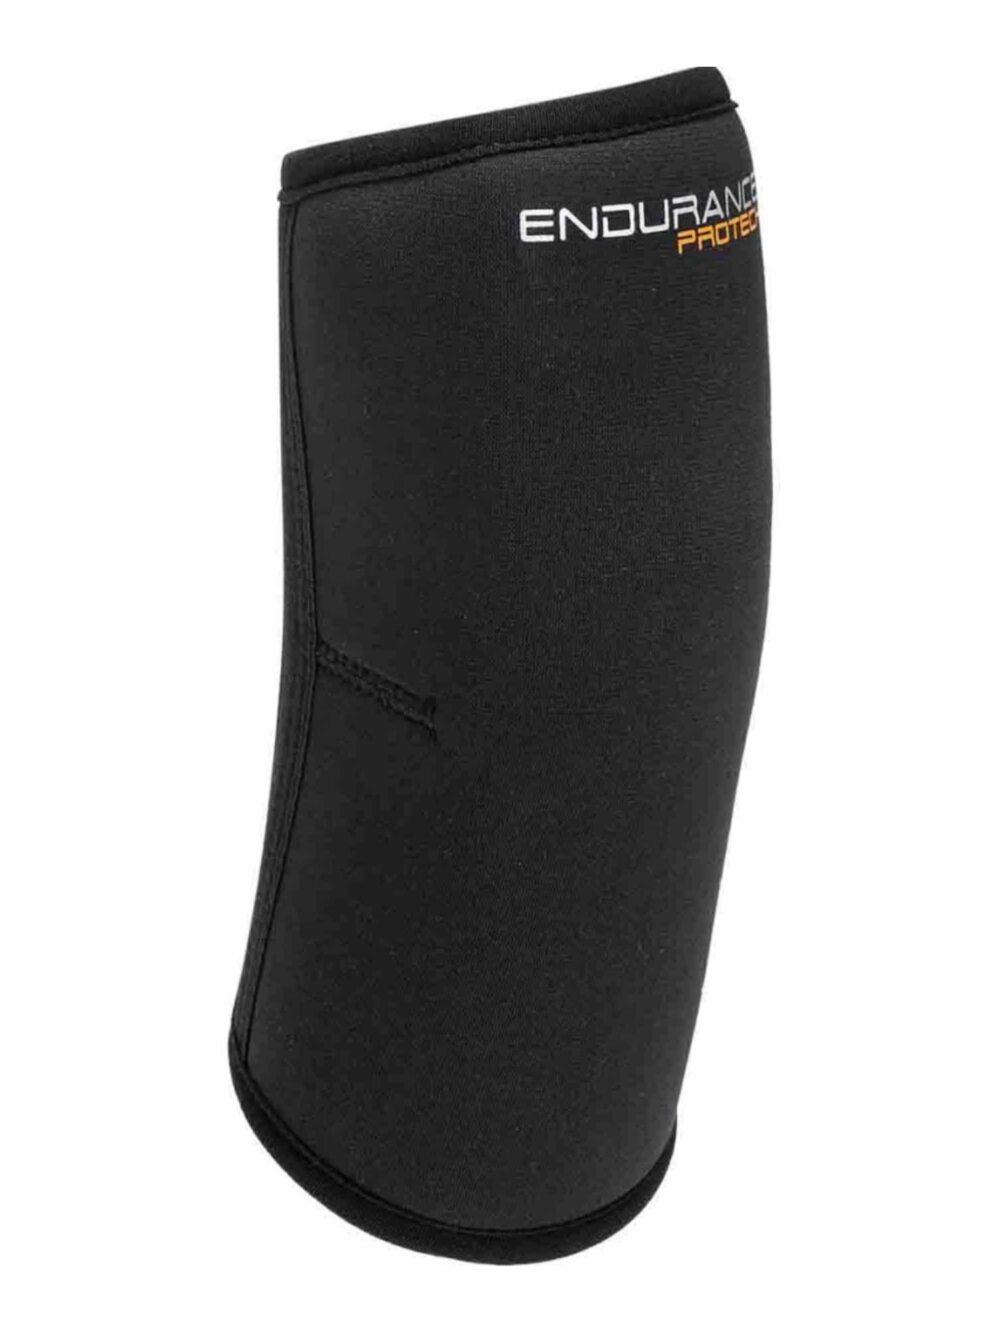 Endurance Protech Neoprene Elbow Support